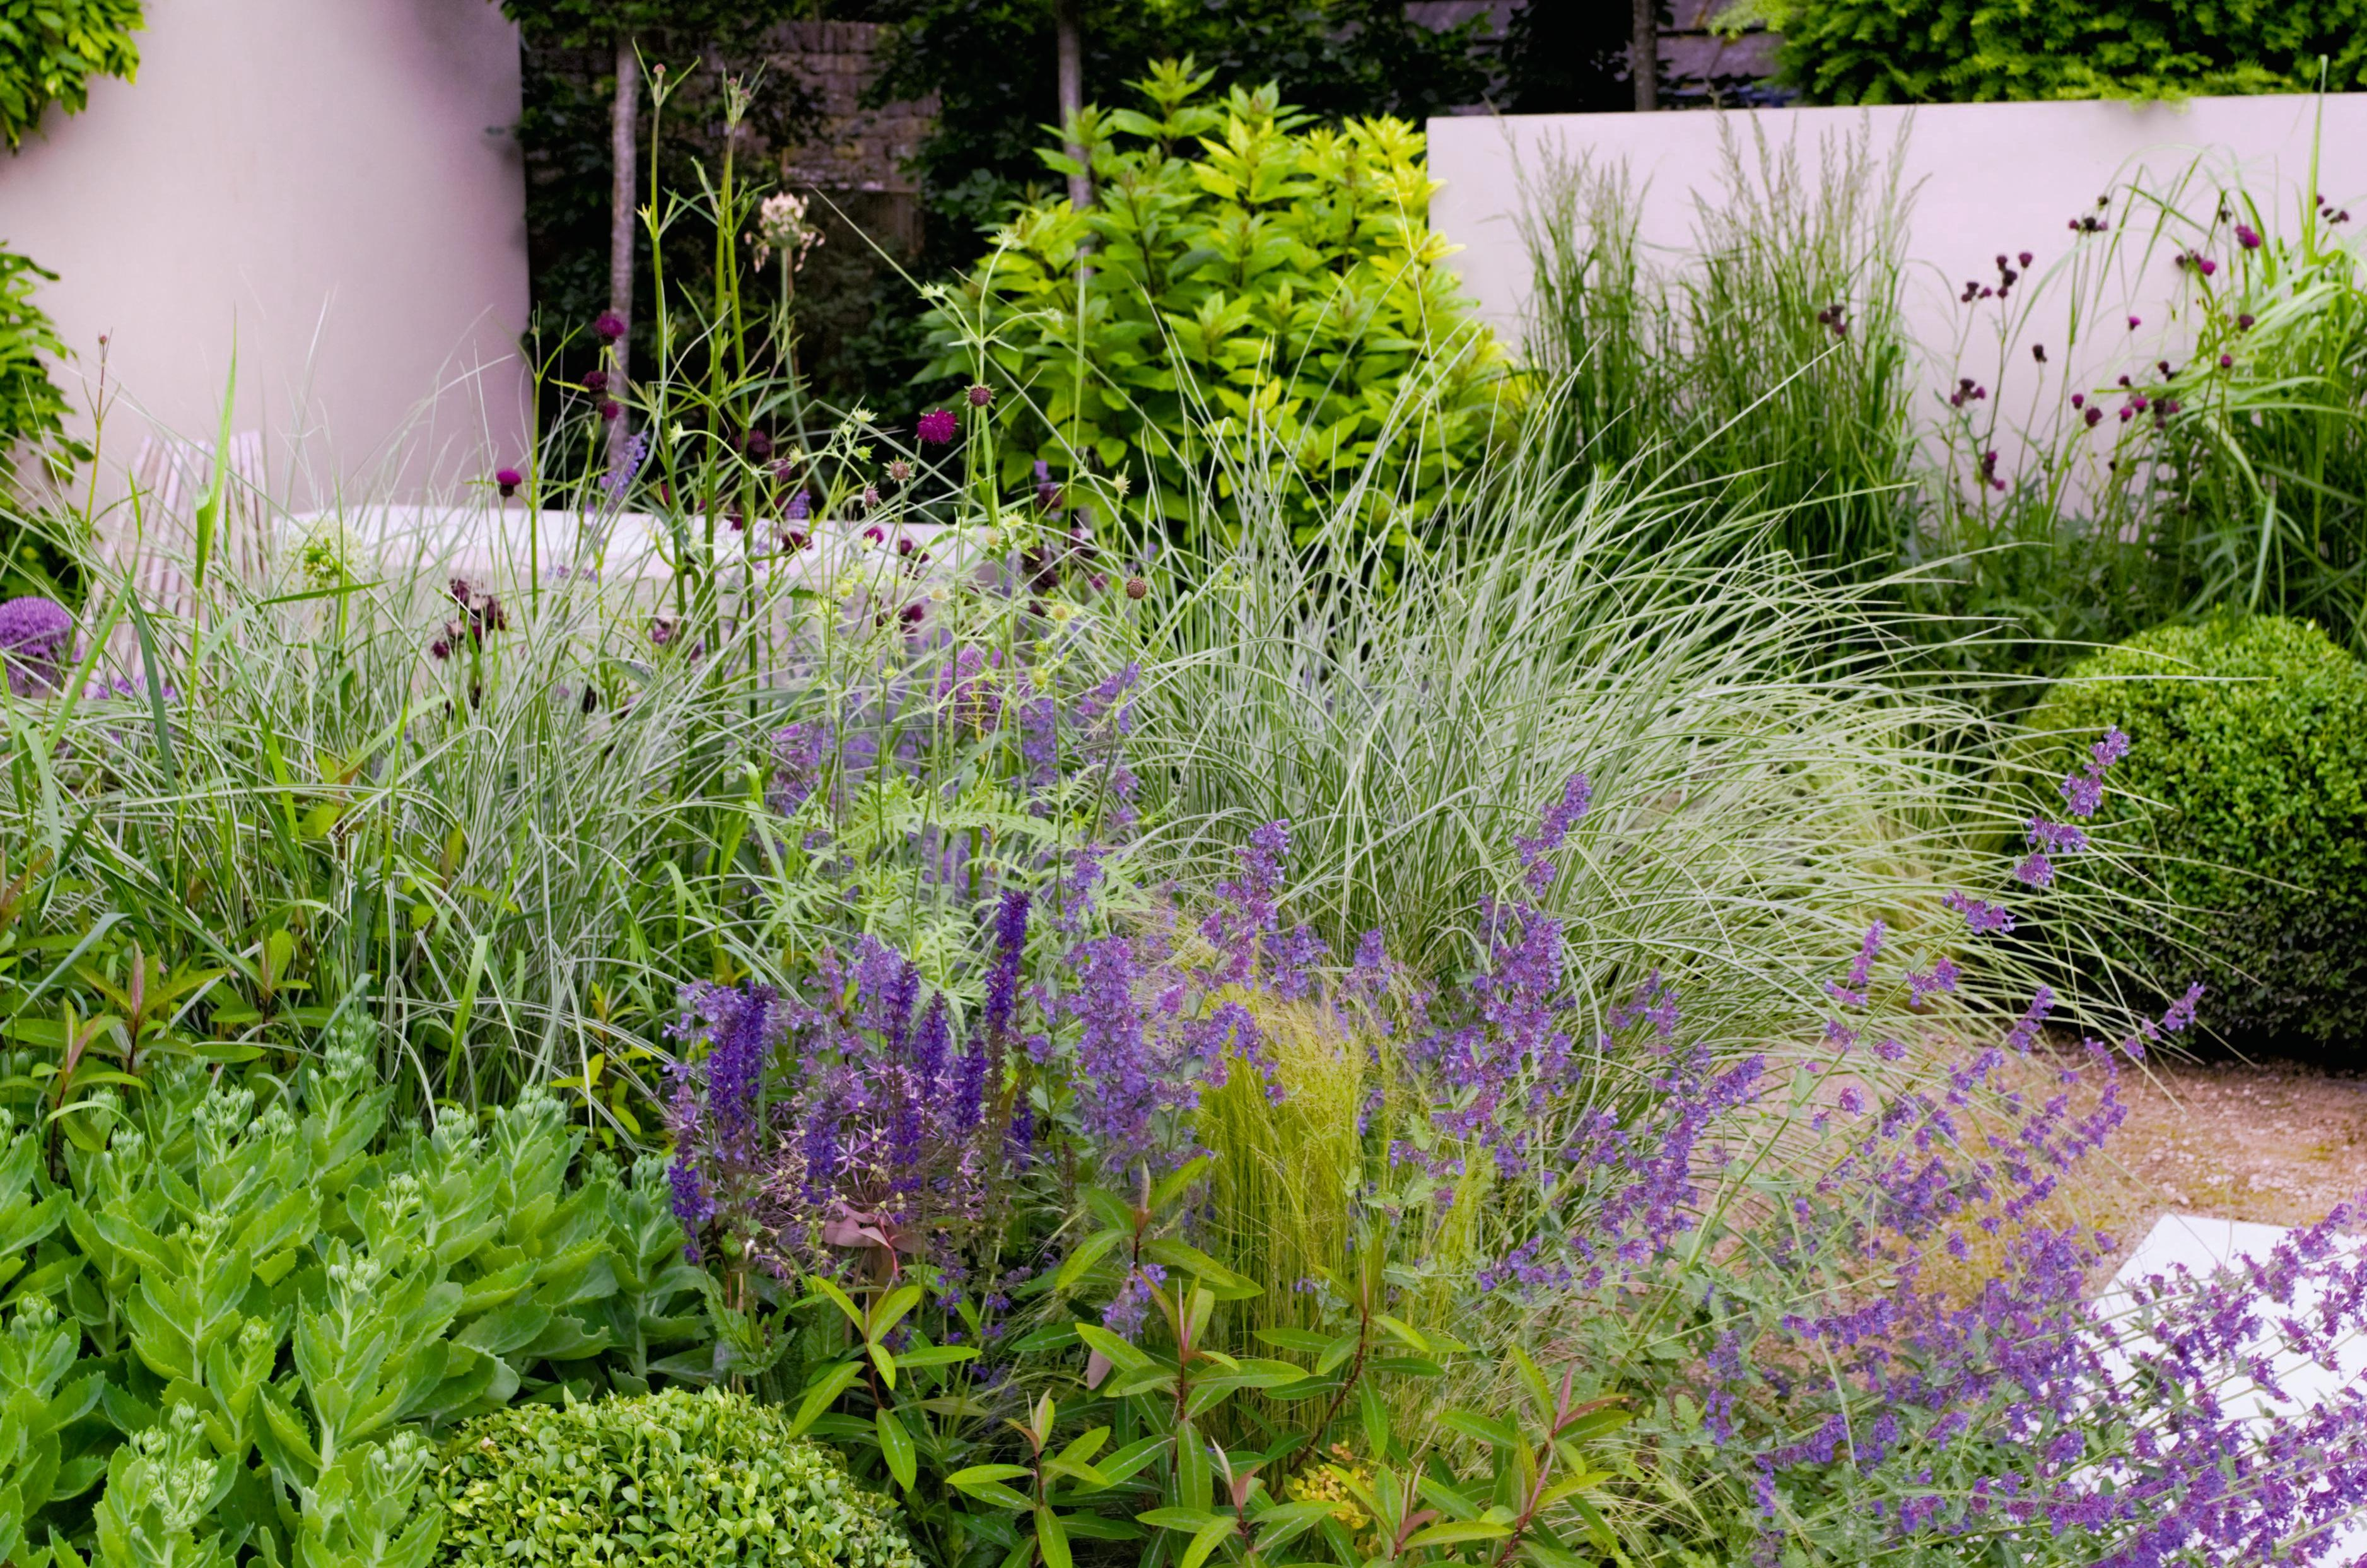 DIY urban gardening hacks for small spaces